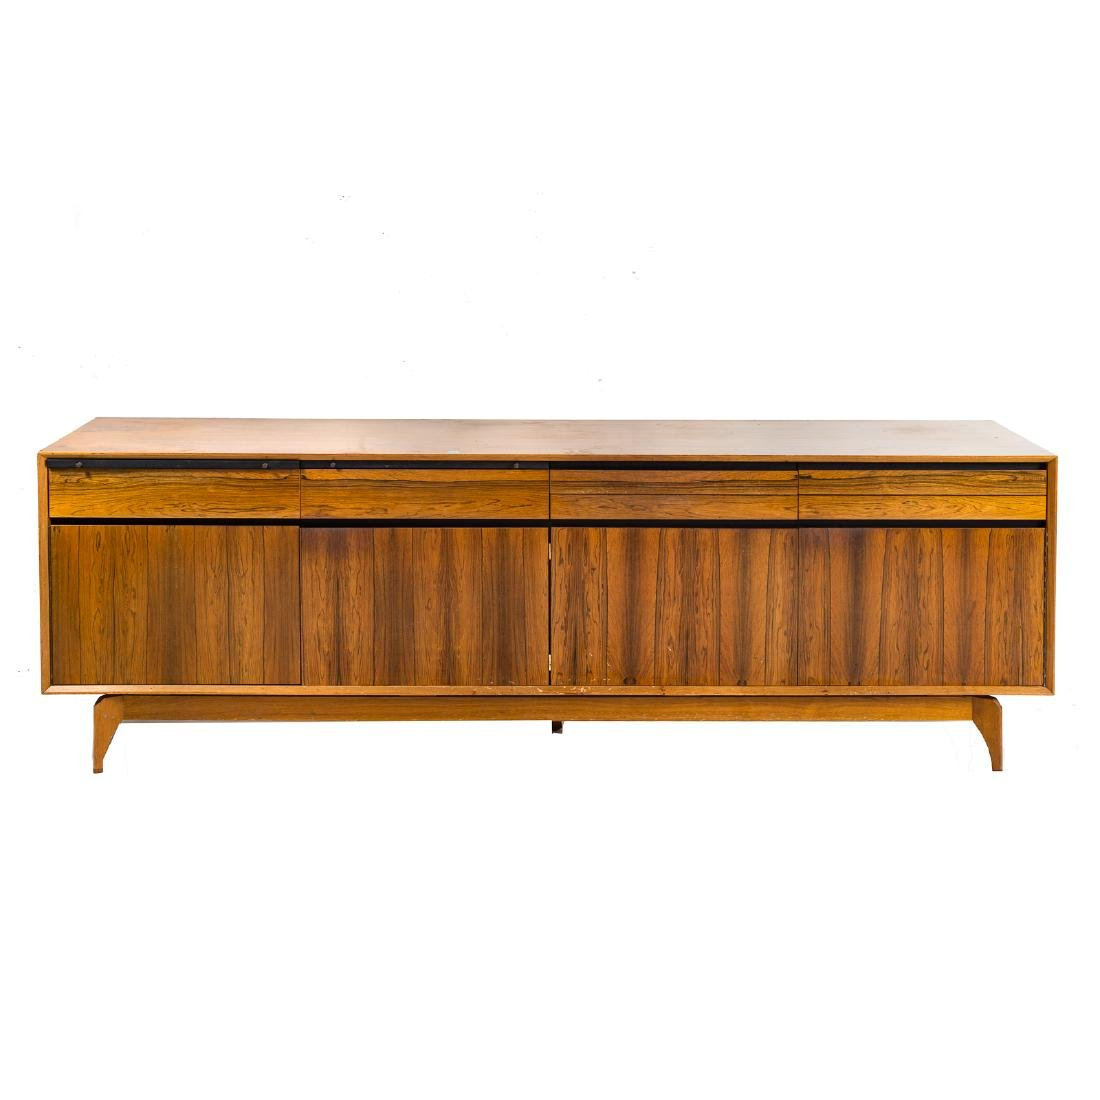 Cabinet-made Mid-Century Modern teakwood credenza